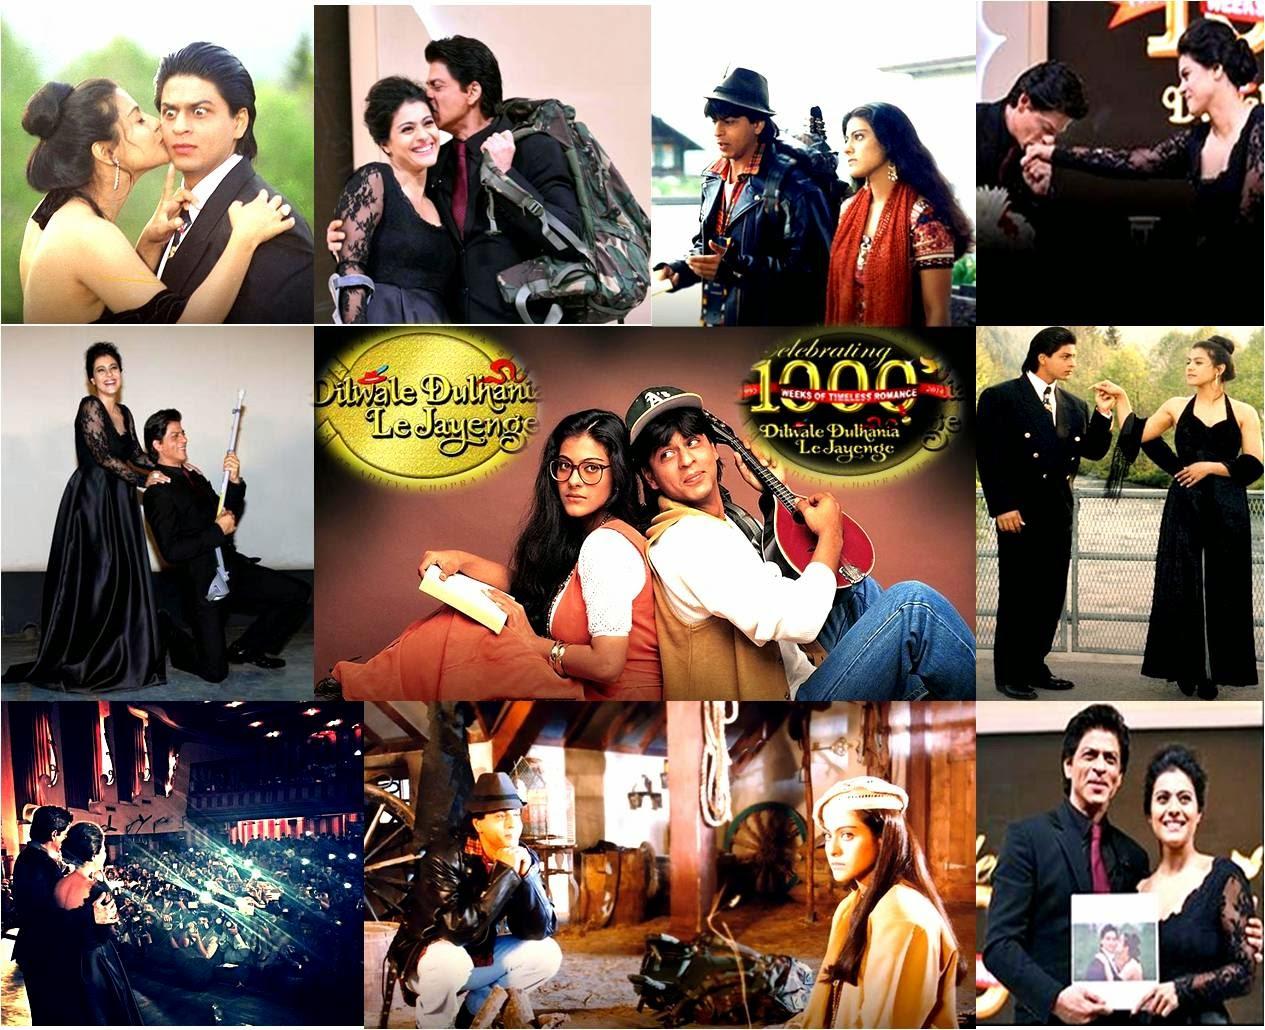 Romantic jodi Shahrukh Khan and Kajol showing sizzling chemistry in Dilwale Dulhania Le Jayenge 1000 weeks and 20 years celebration event